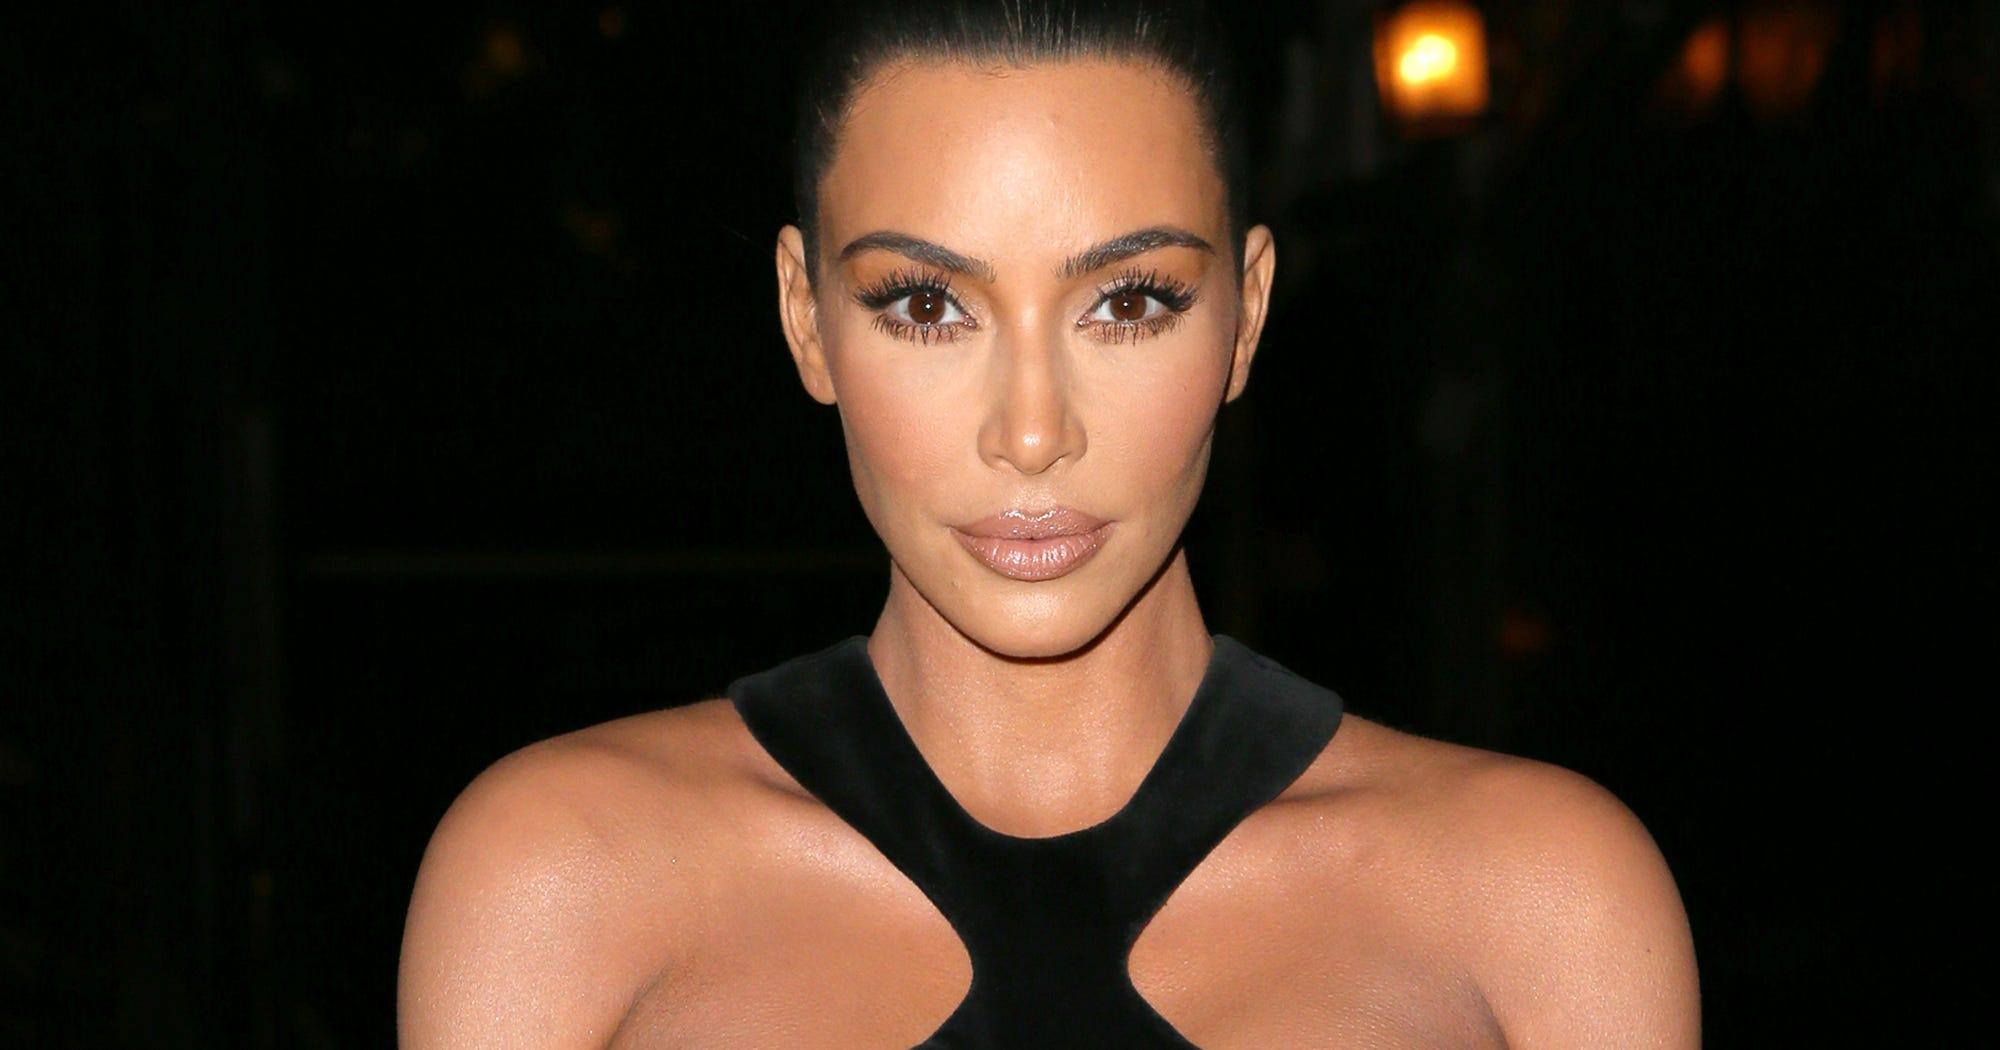 c6eb98aed46b Kardashian Drama Leading Up To KUWTK Season 16 Premiere